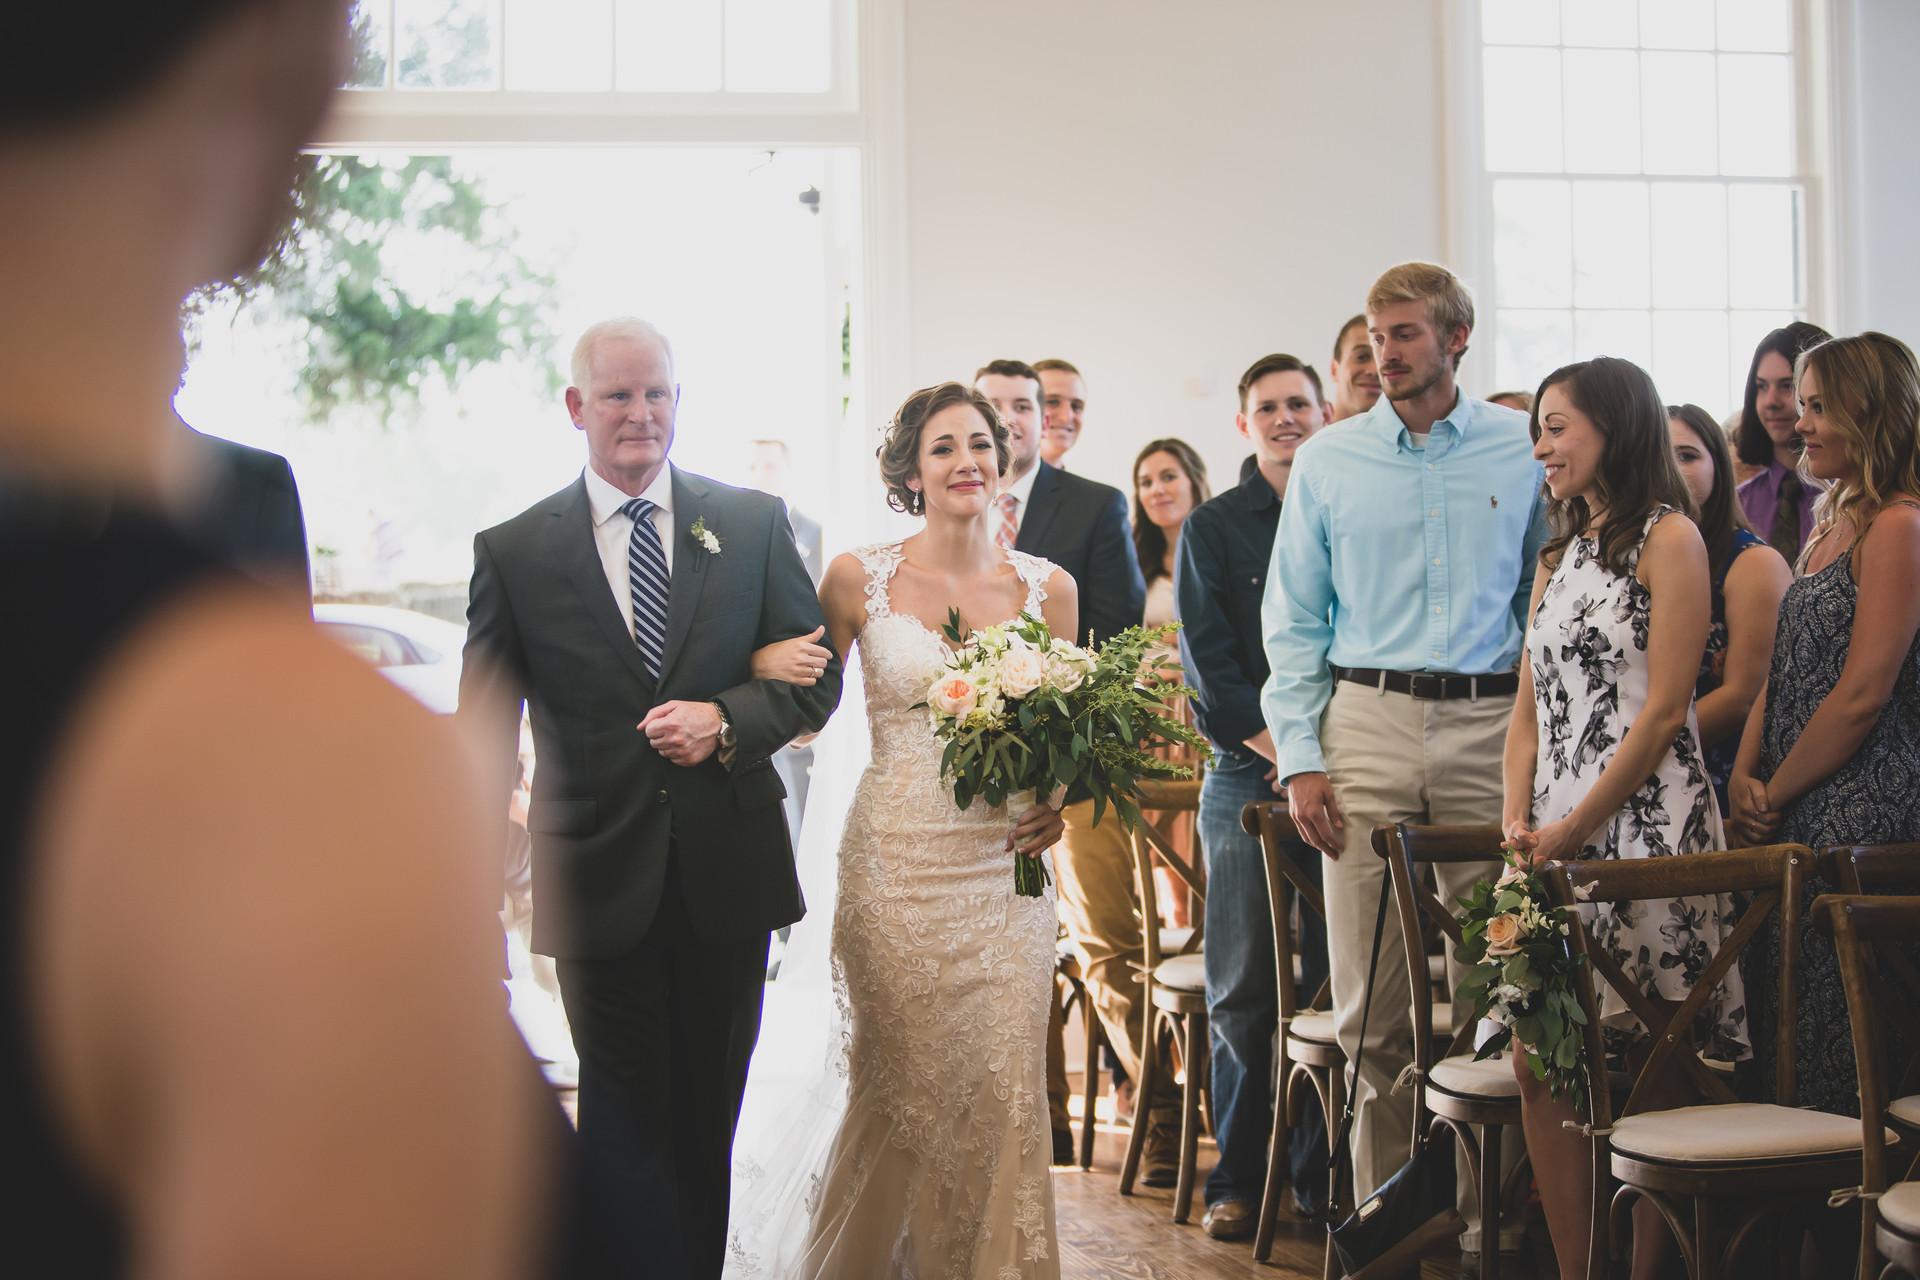 Krazit-Wedding-3.jpg